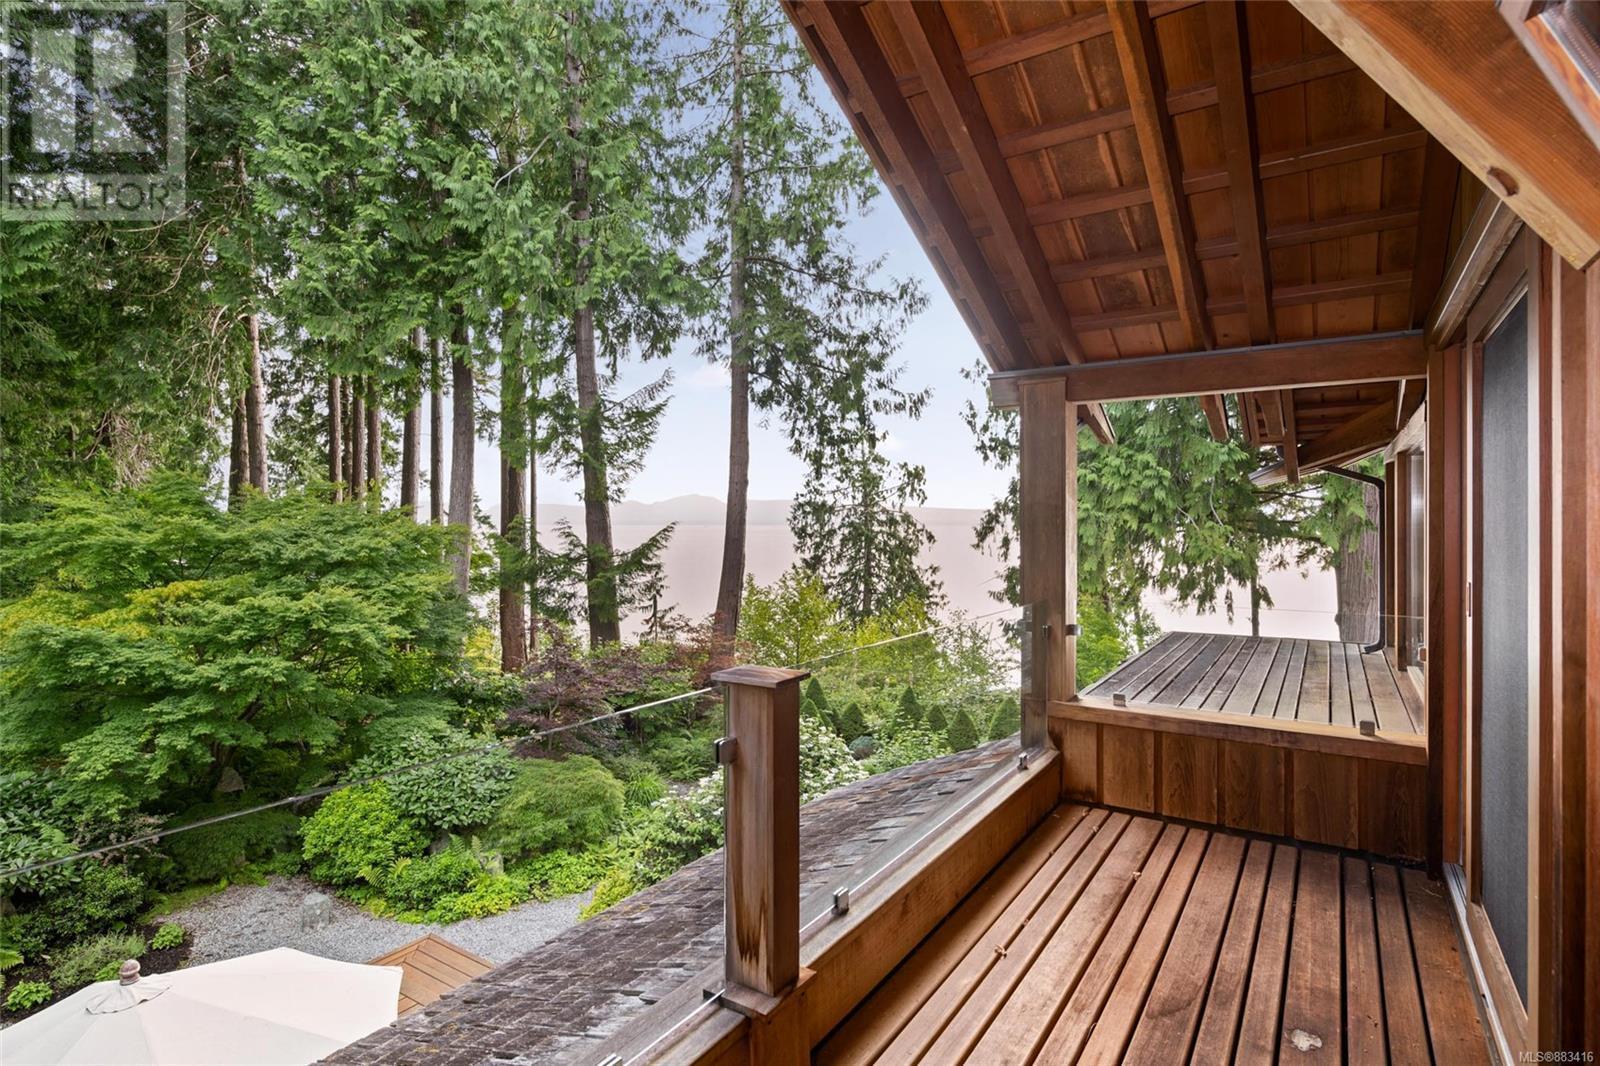 309 Sutil Point RdCortes Island, British Columbia  V0P 1K0 - Photo 55 - 883416